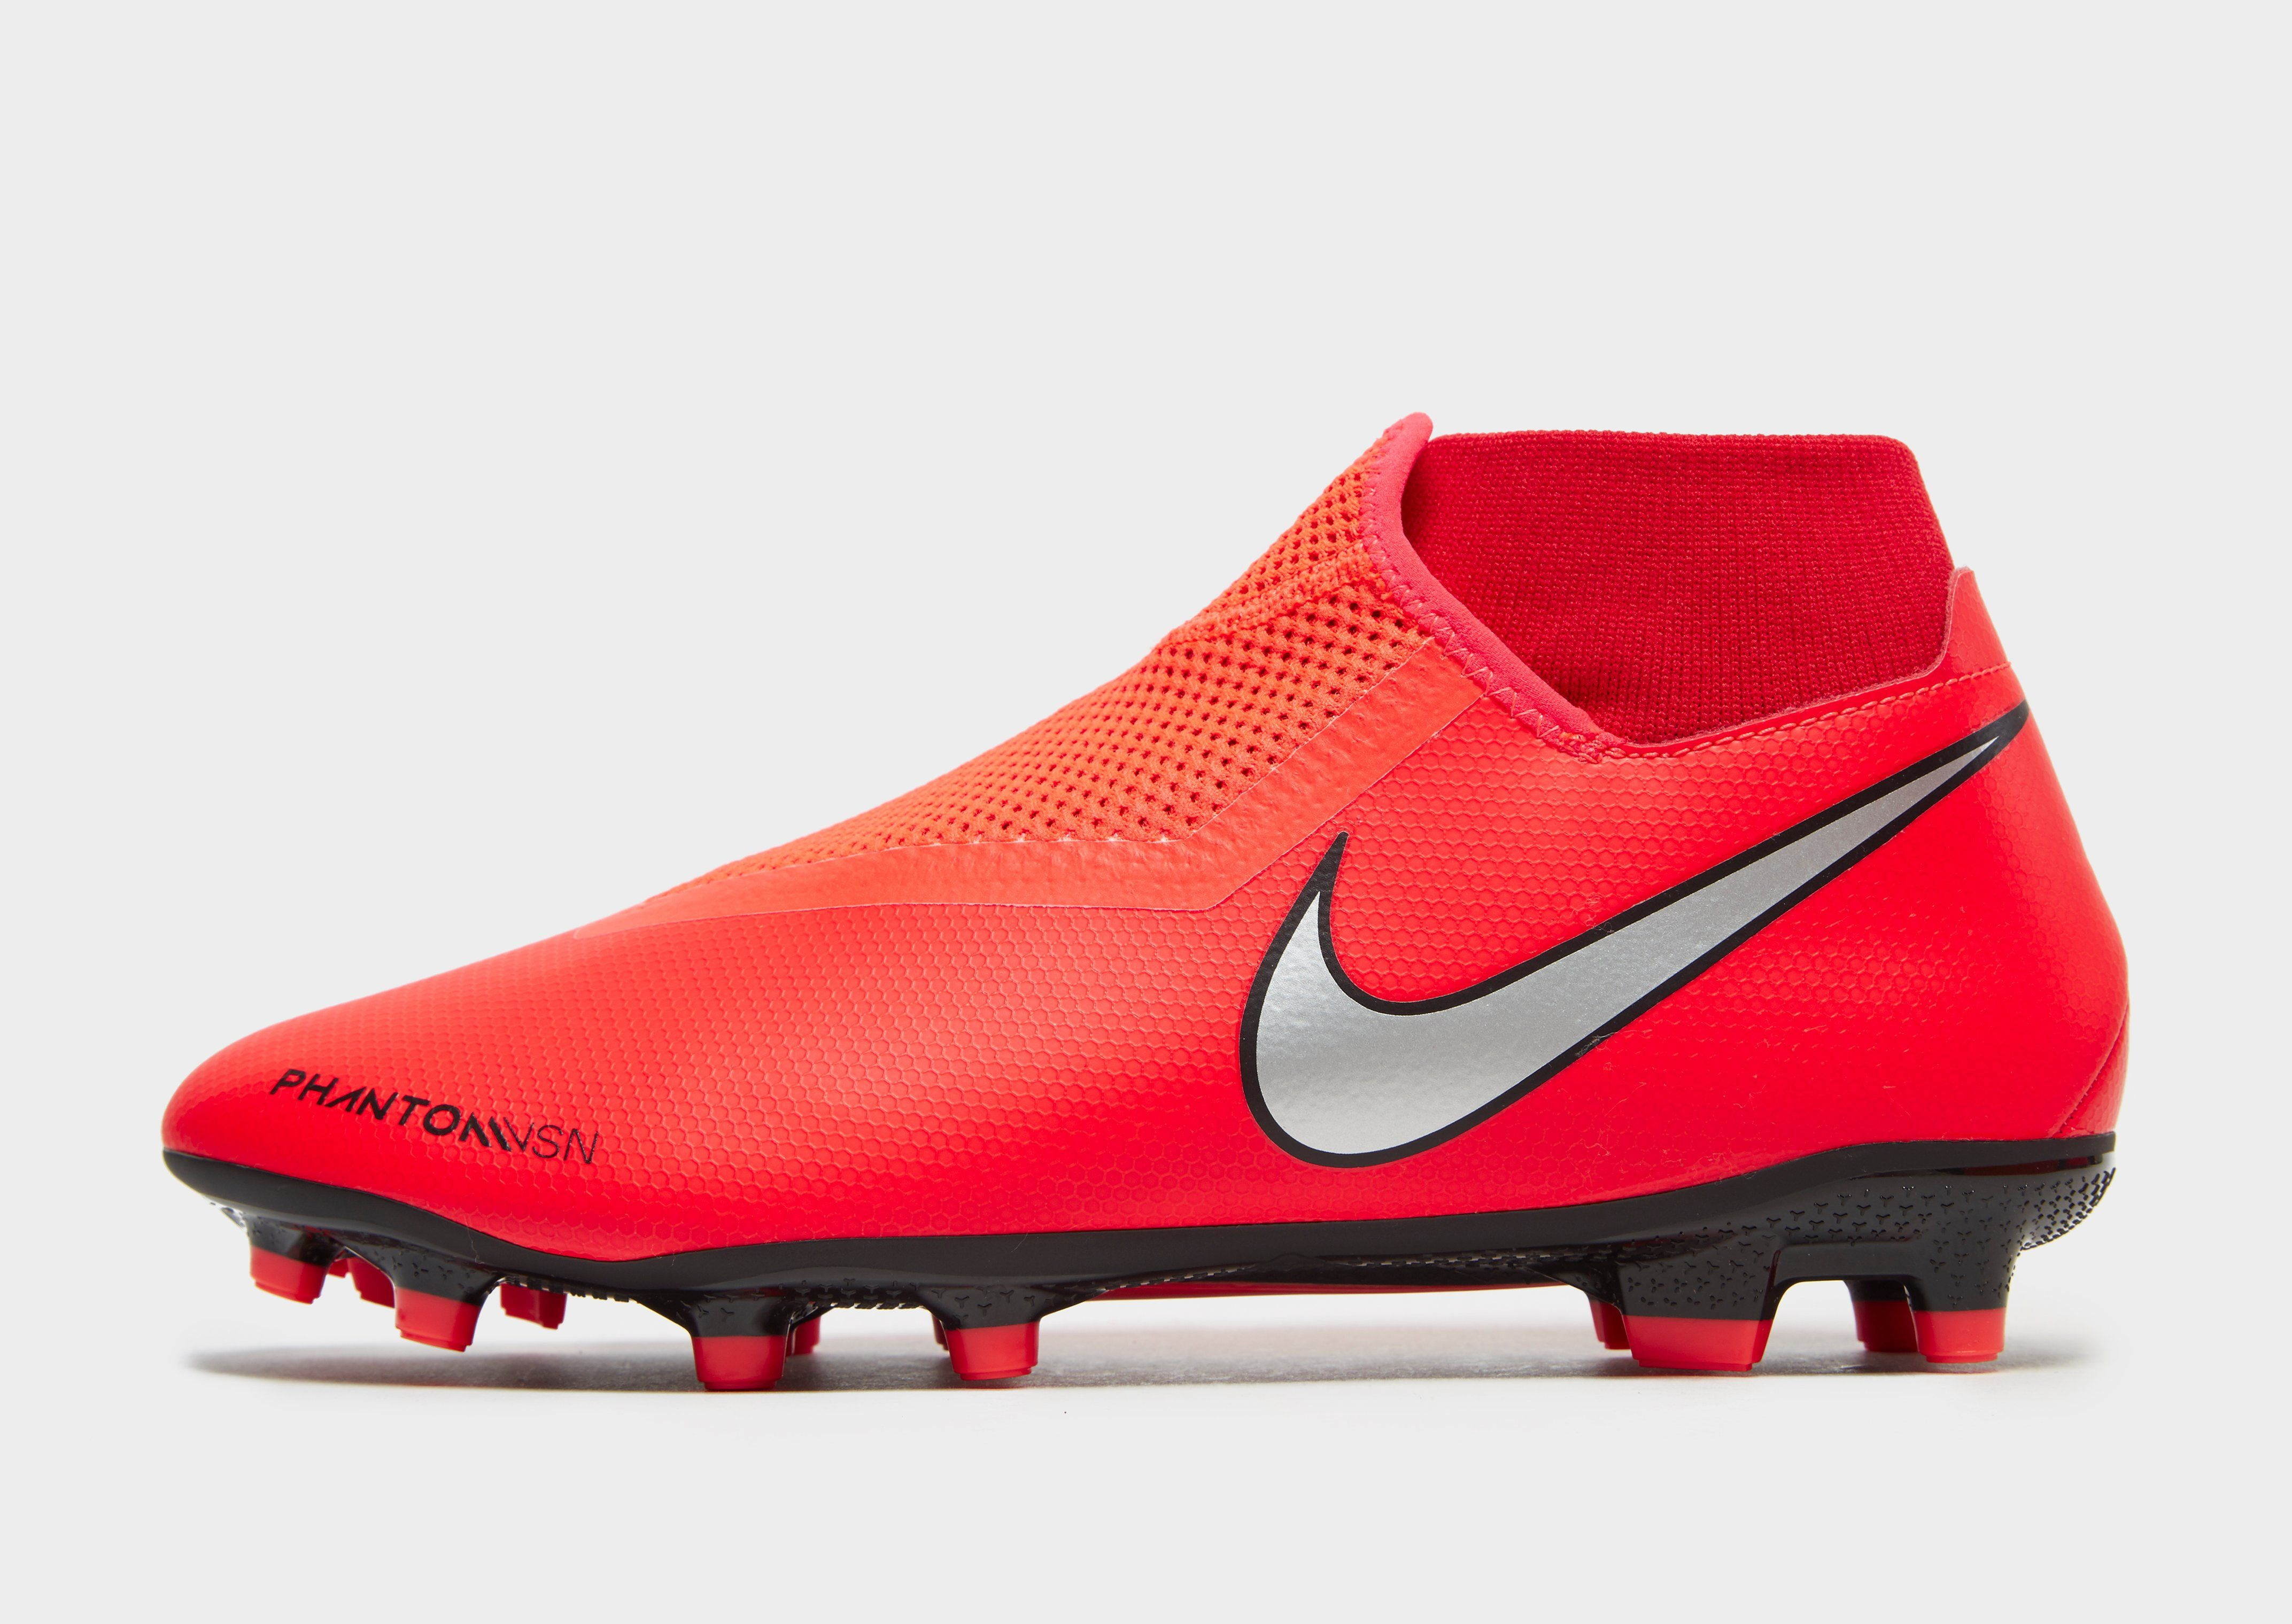 edbc496db NIKE Nike Phantom Vision Academy Dynamic Fit MG Multi-Ground Football Boot